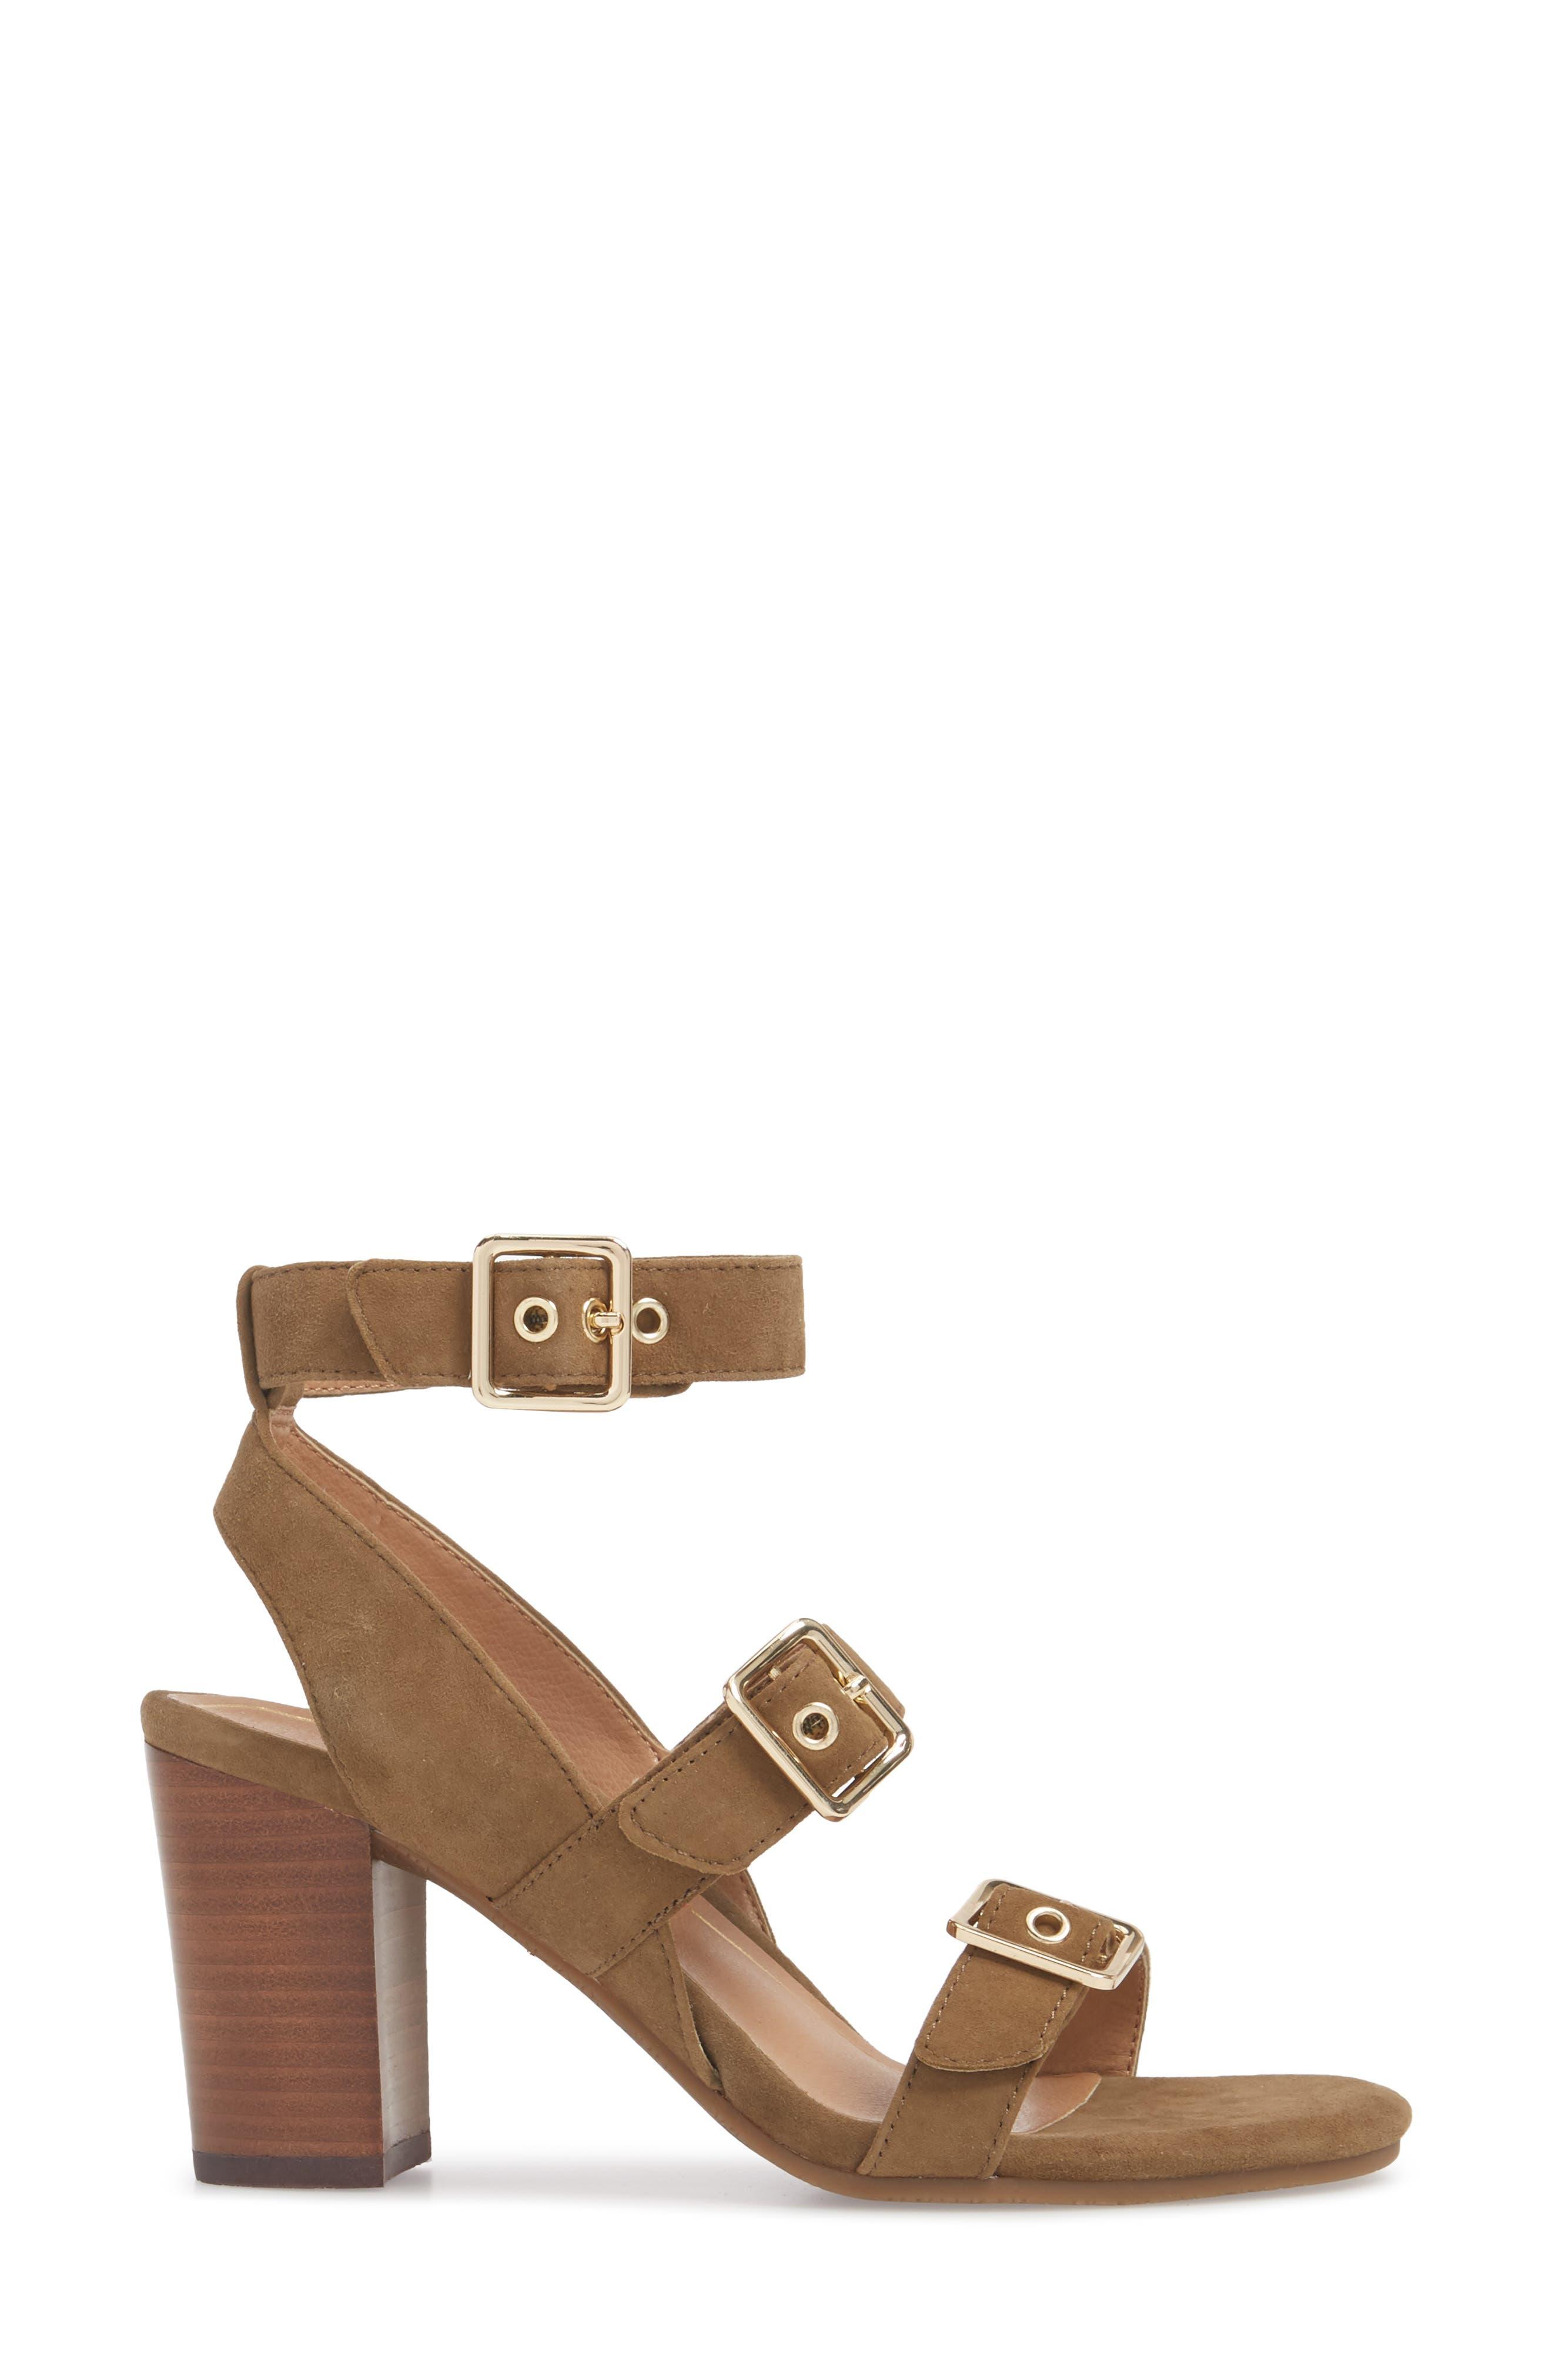 Carmel Block Heel Sandal,                             Alternate thumbnail 3, color,                             310